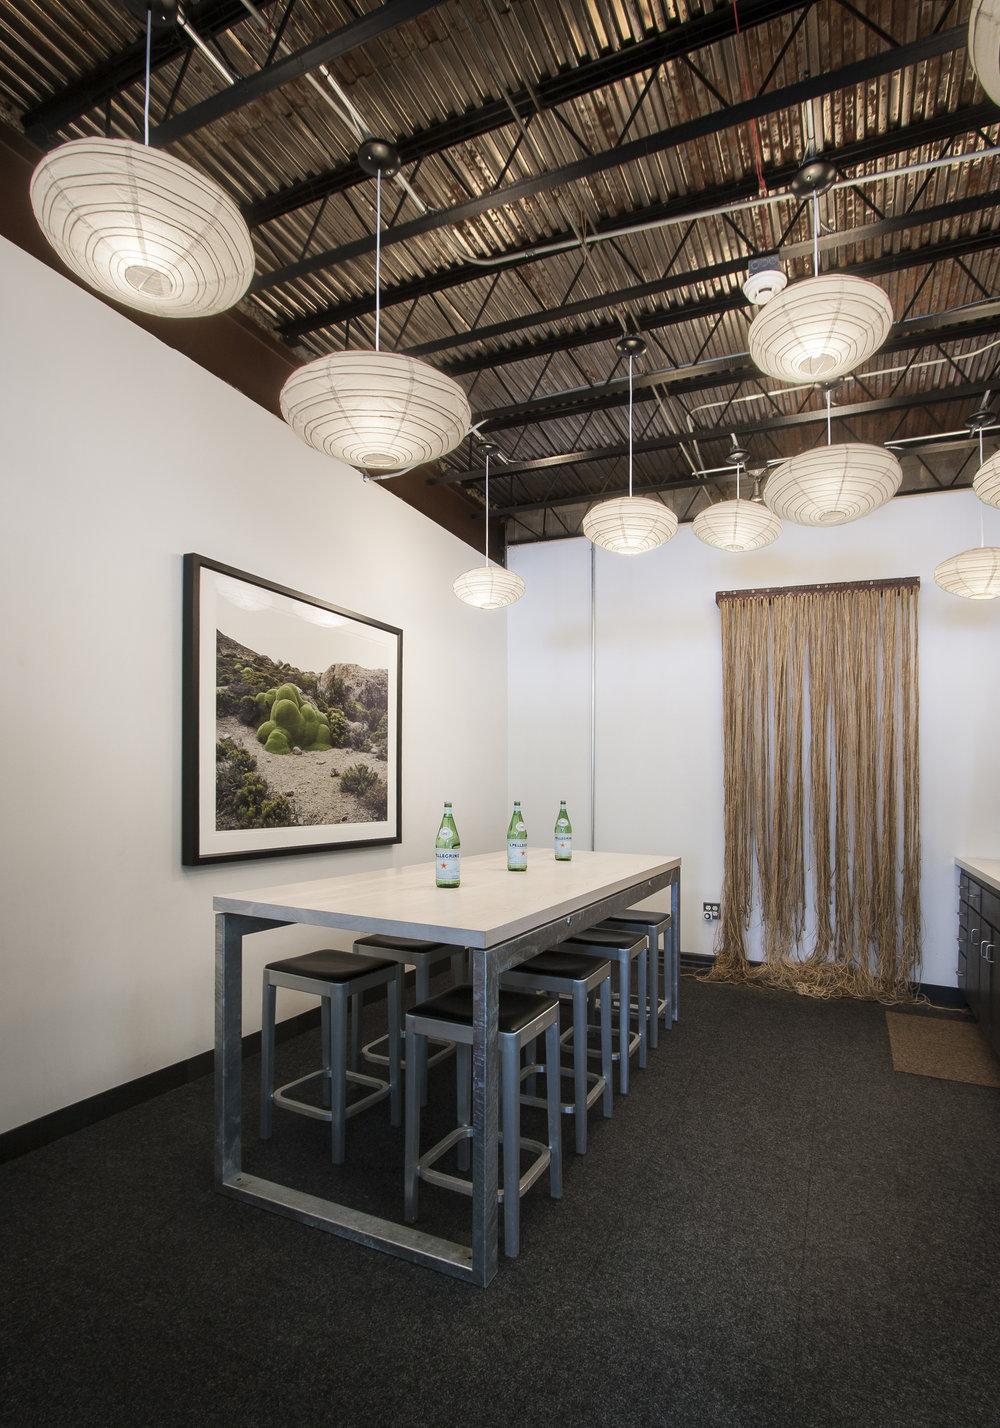 Kitchen area of NewStudio Architecture's original office